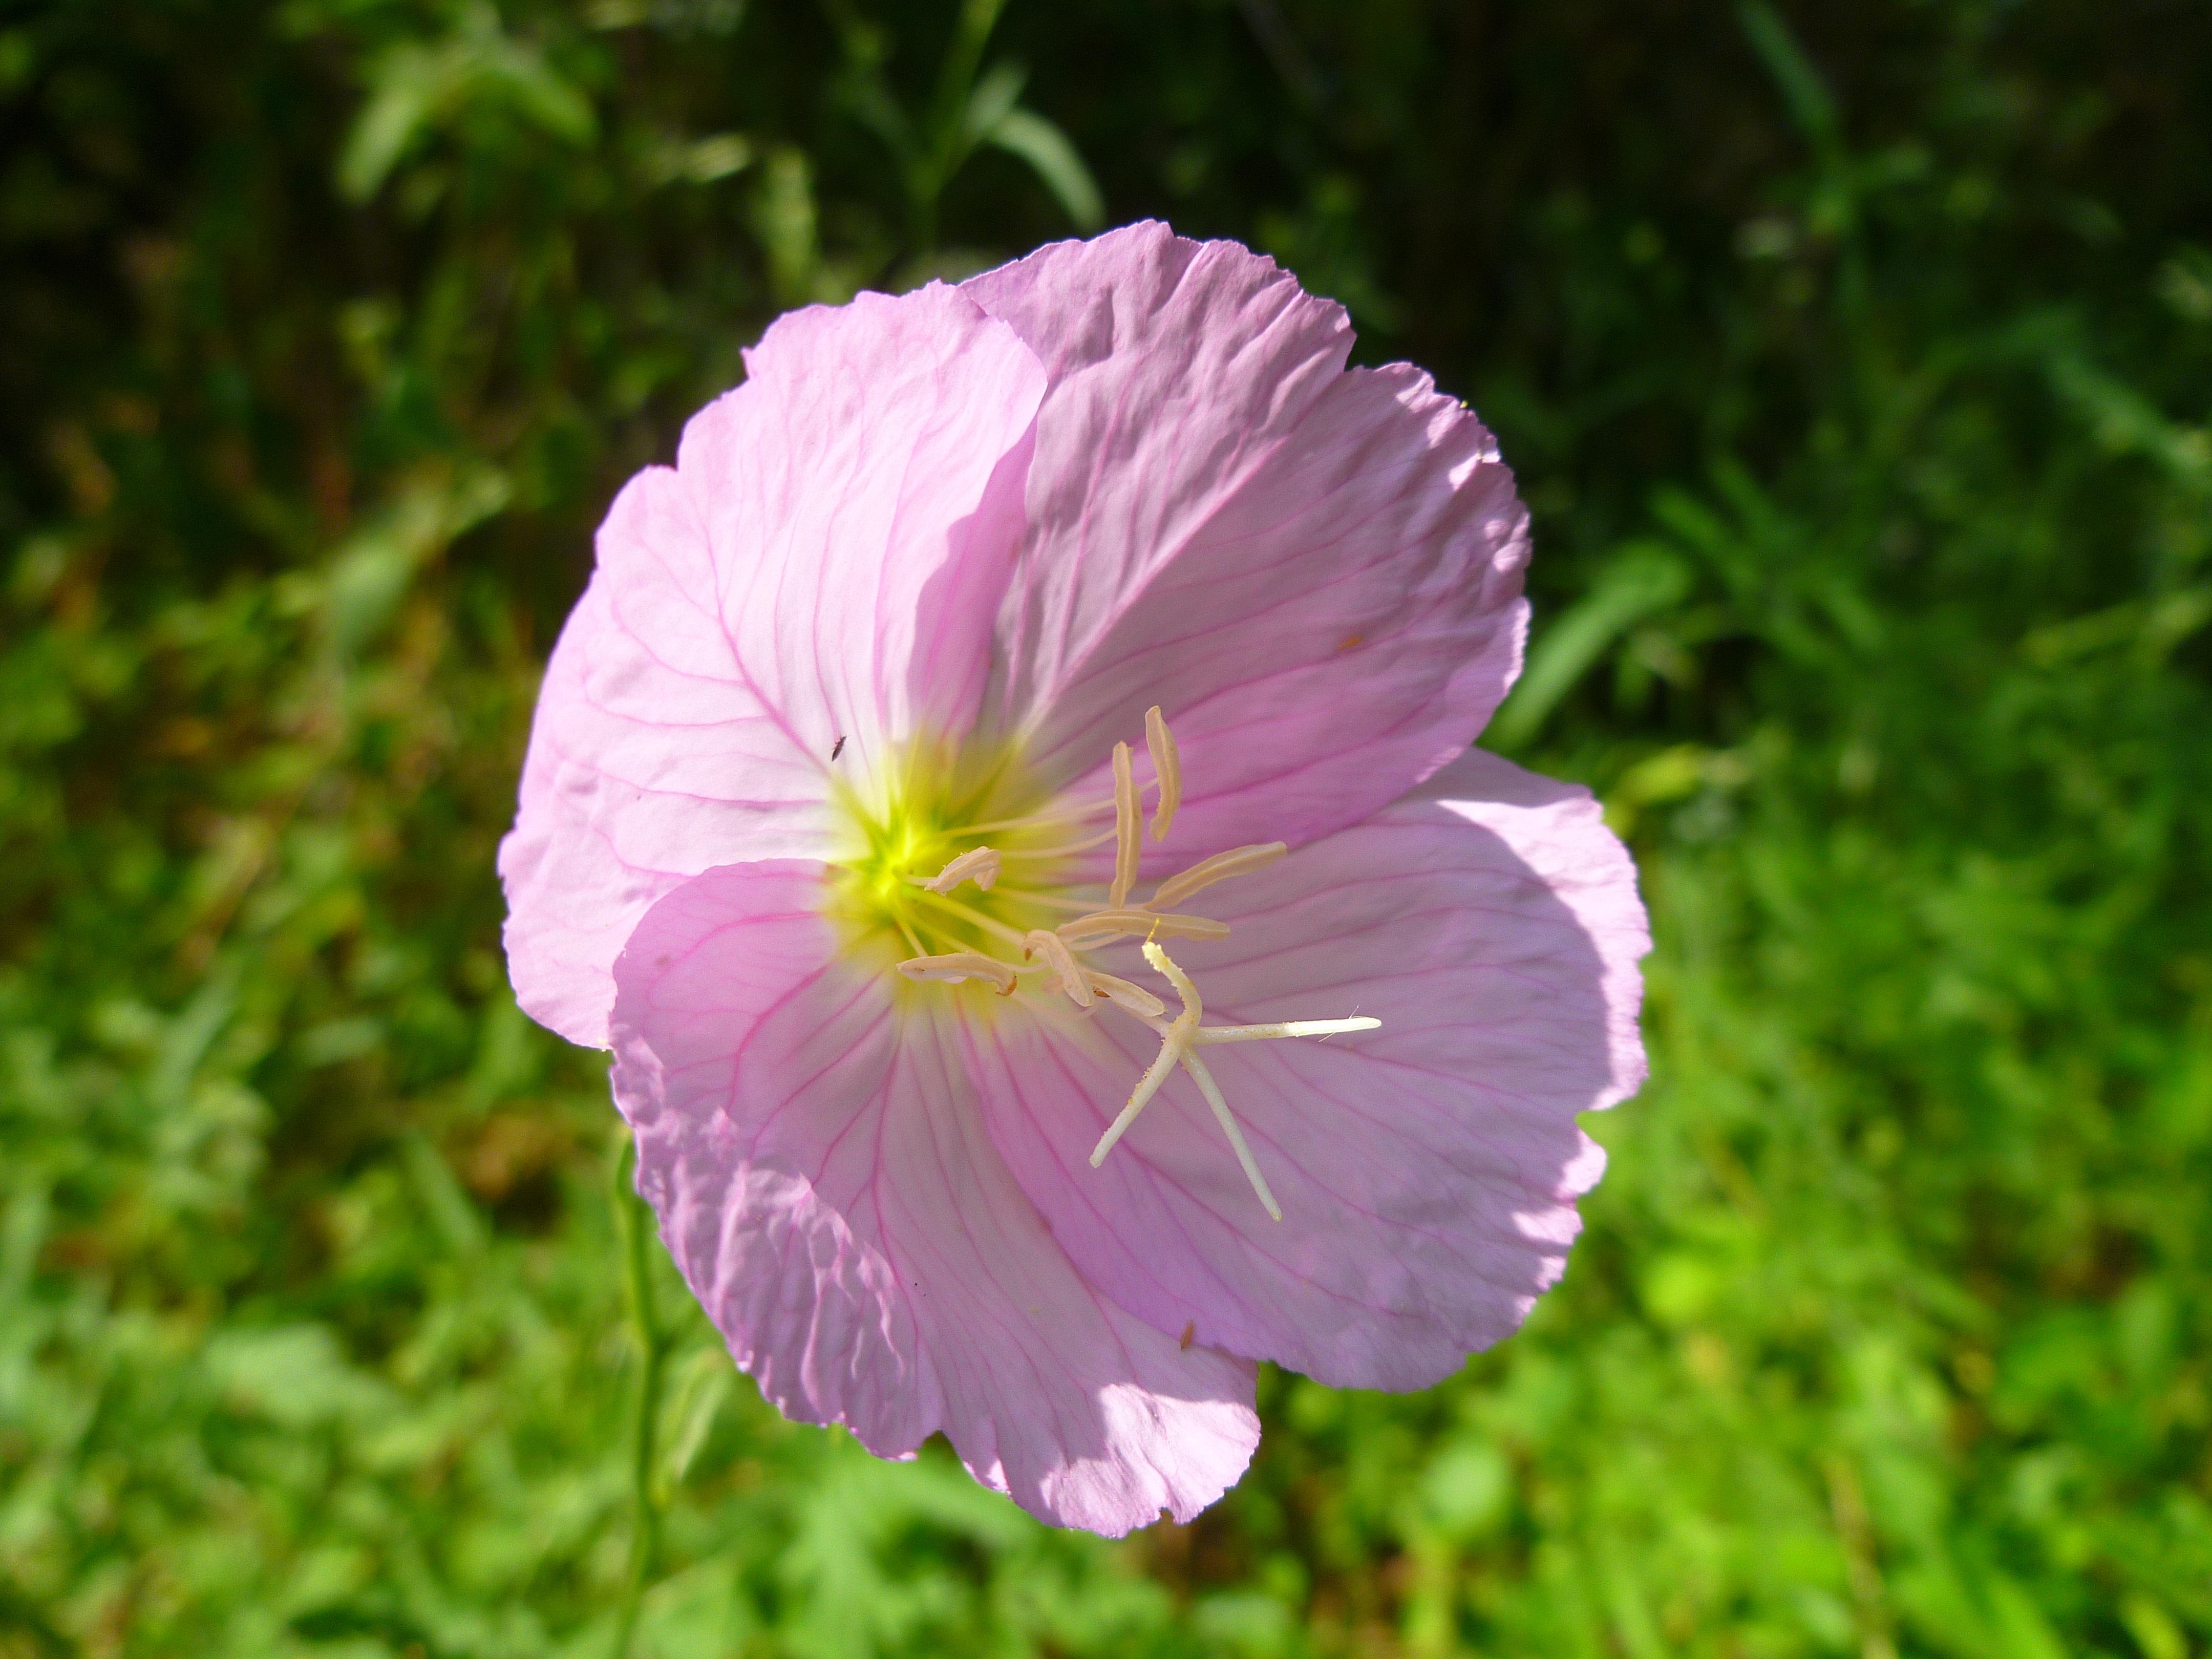 Image of rose evening primrose